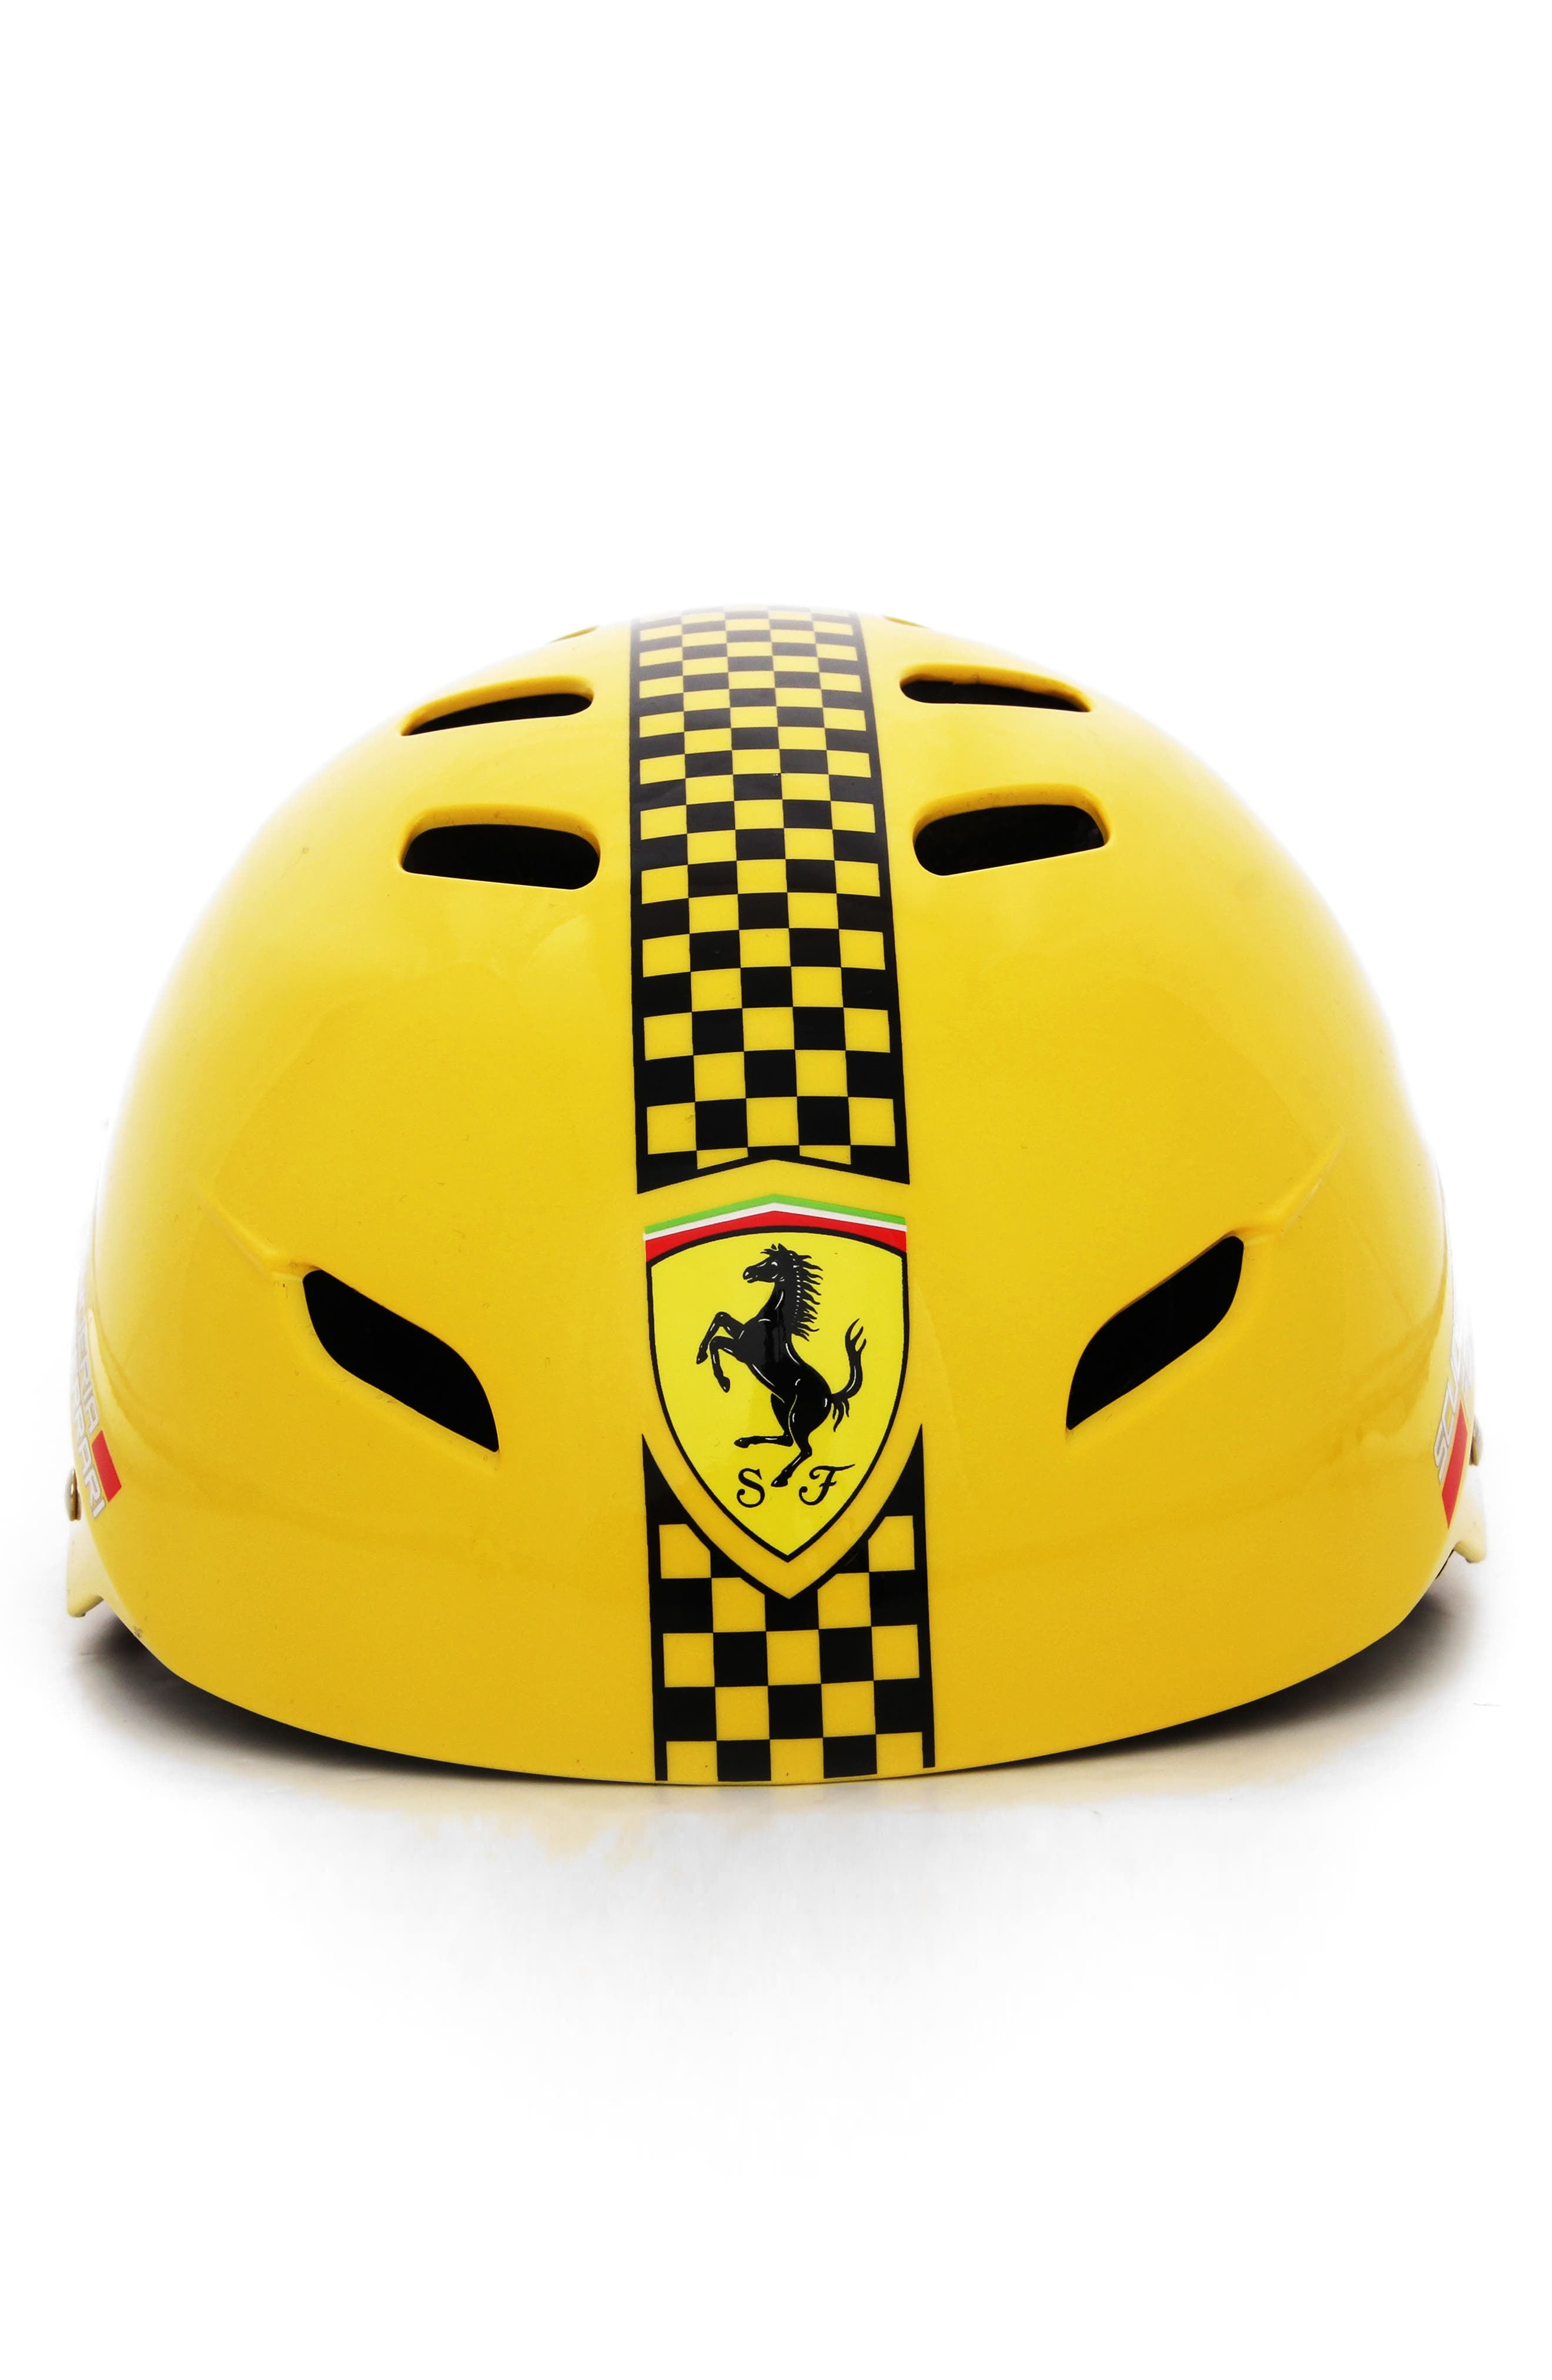 F1 Racing Helmet,                             Main thumbnail 1, color,                             YELLOW